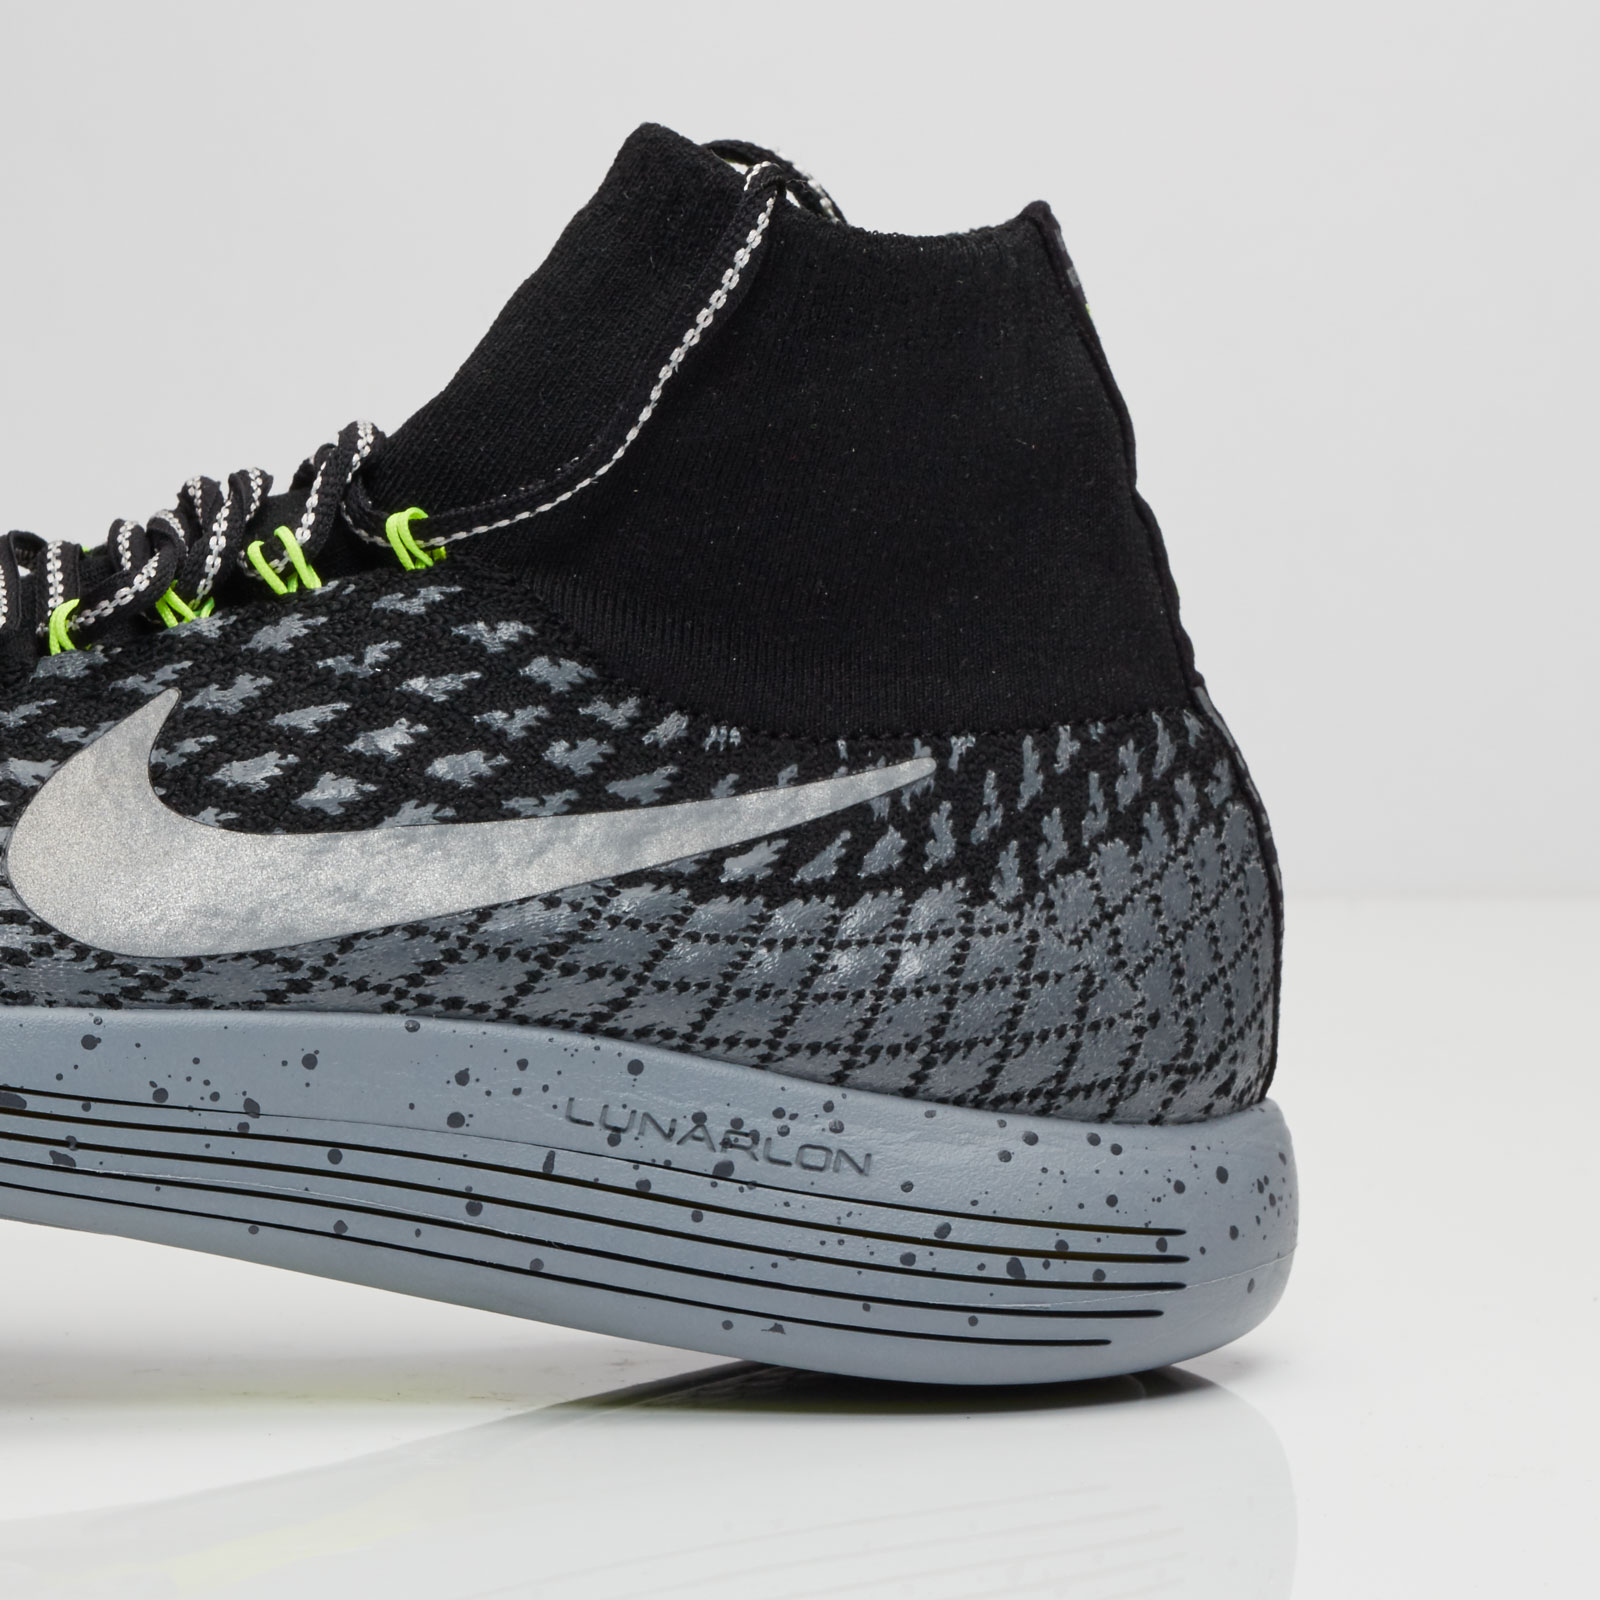 c178259305ae4 Nike Wmns Lunarepic Flyknit SH - 849665-001 - Sneakersnstuff ...